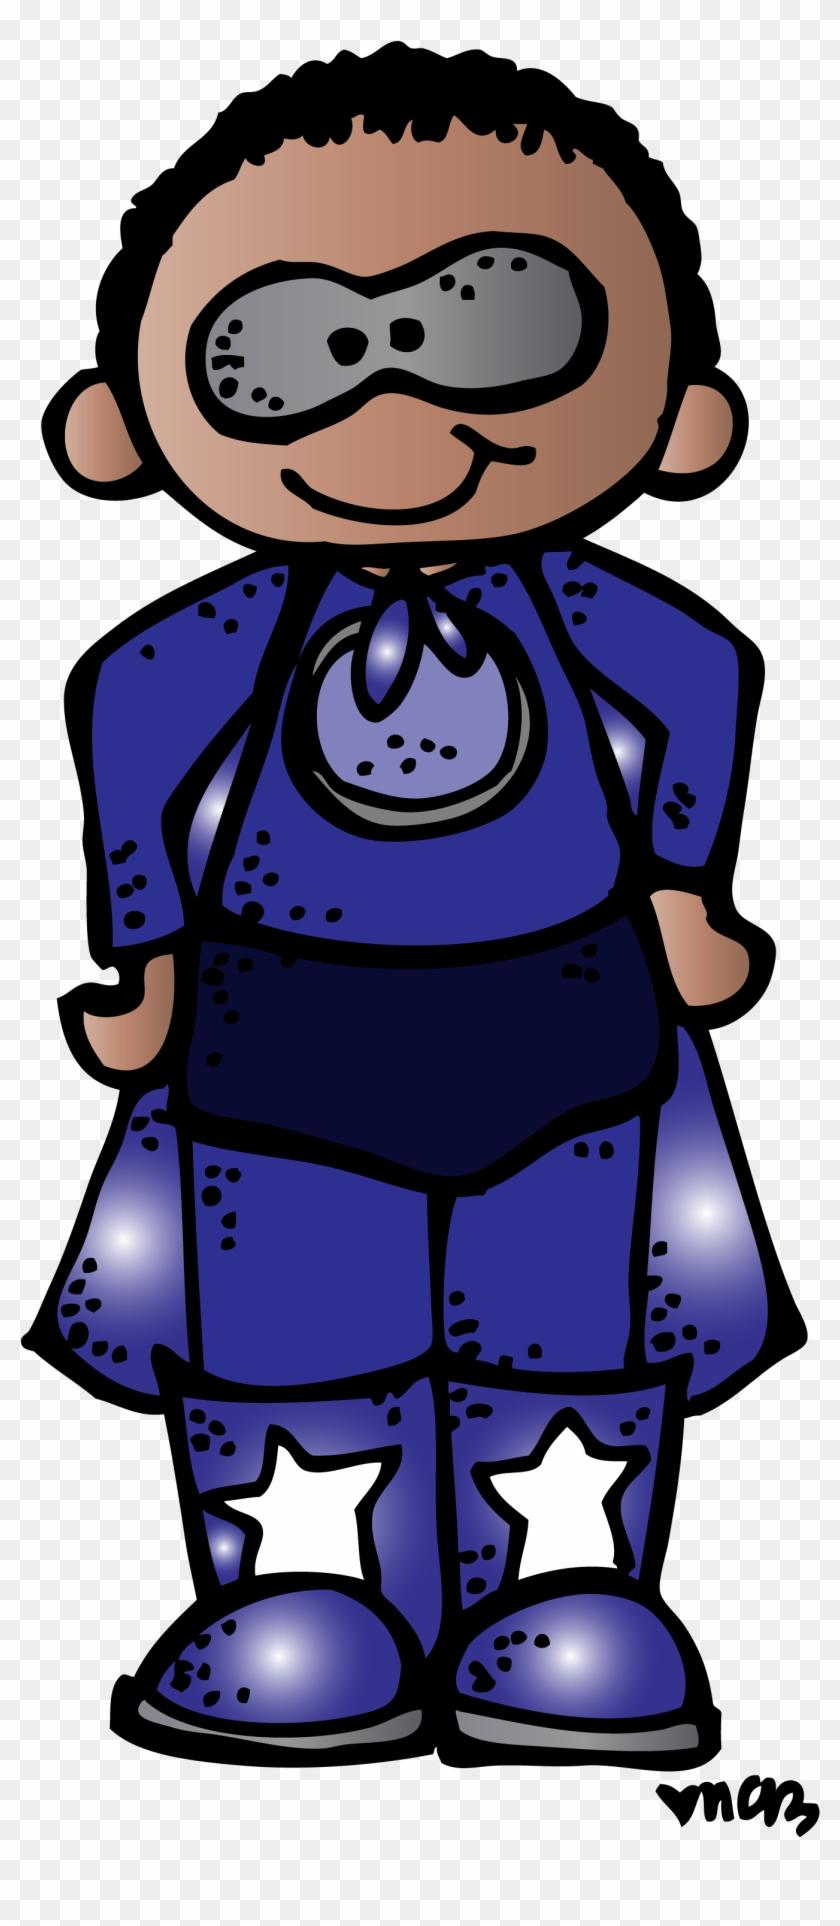 Batman Clipart Melonheadz - Melonheadz Gafetes Superheroes - Png Download #3572591